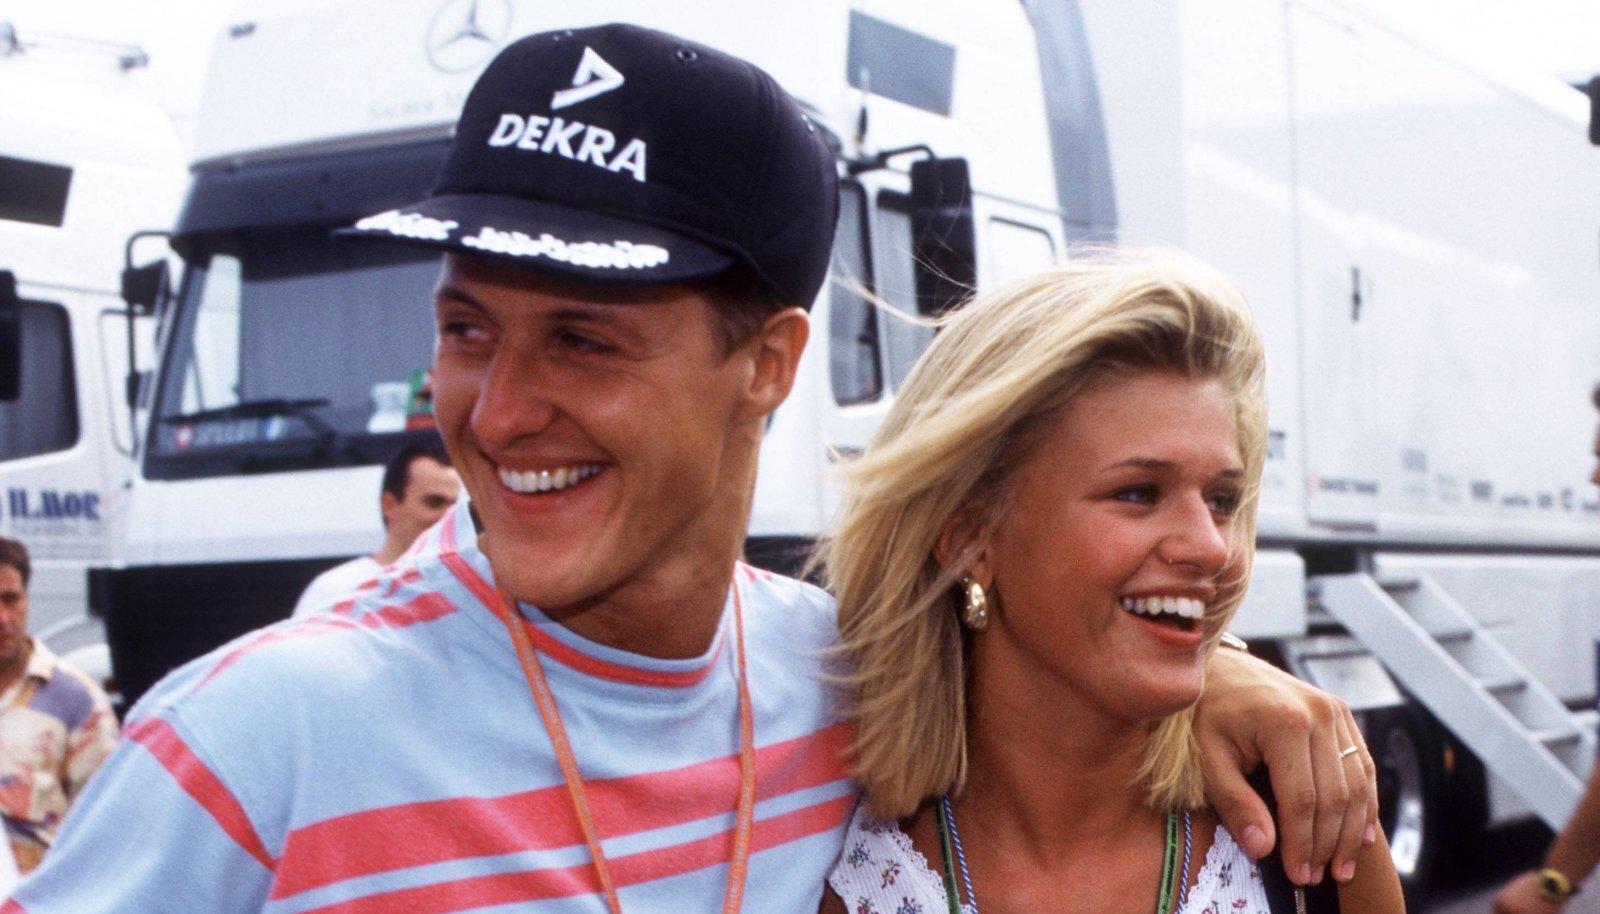 Corinna Schumacher käis Michaeli hiilgeaegadel igal F1 etapil kaasas.